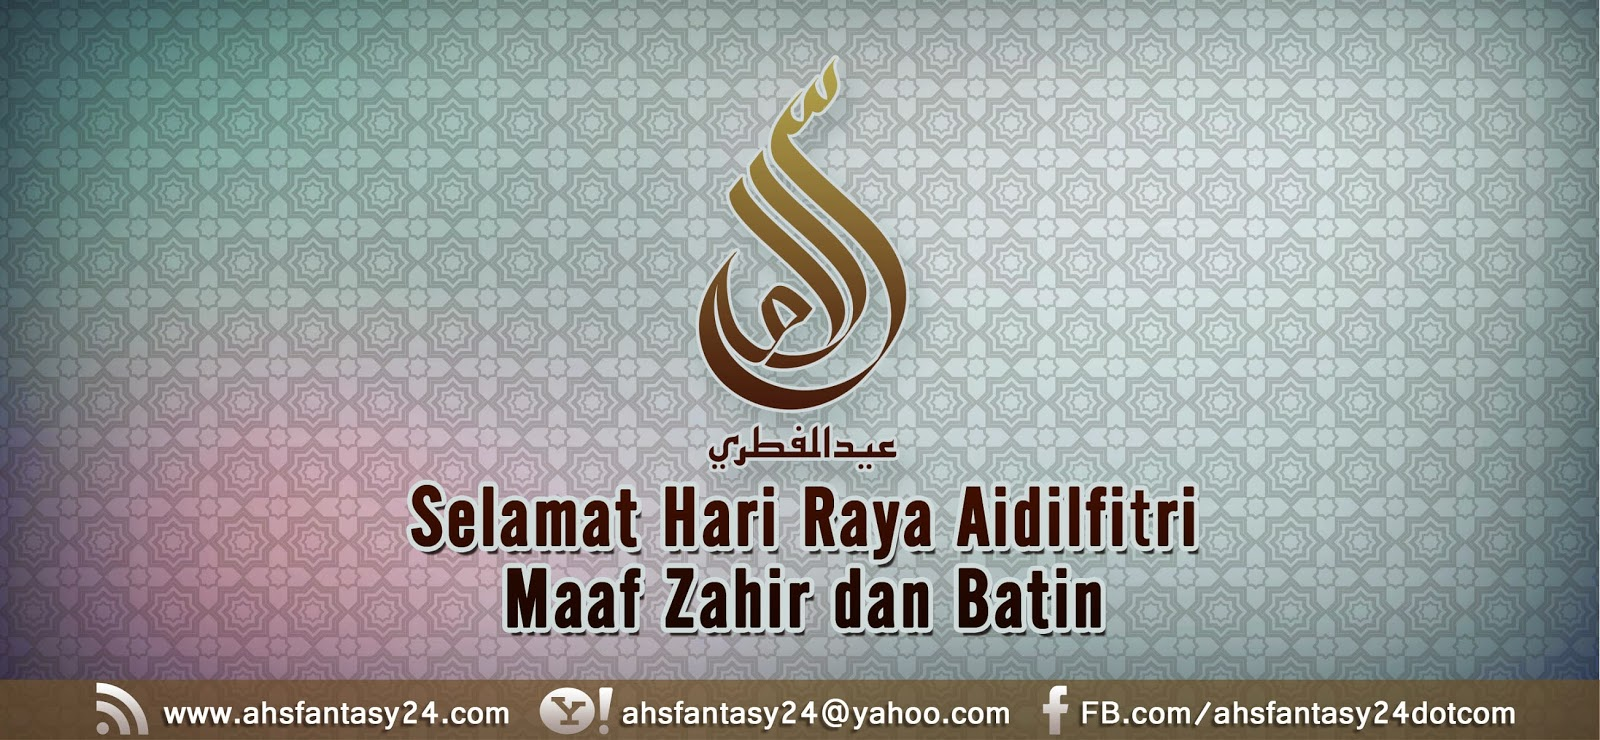 Salam Aidilfitri Maaf Zahir dan Batin